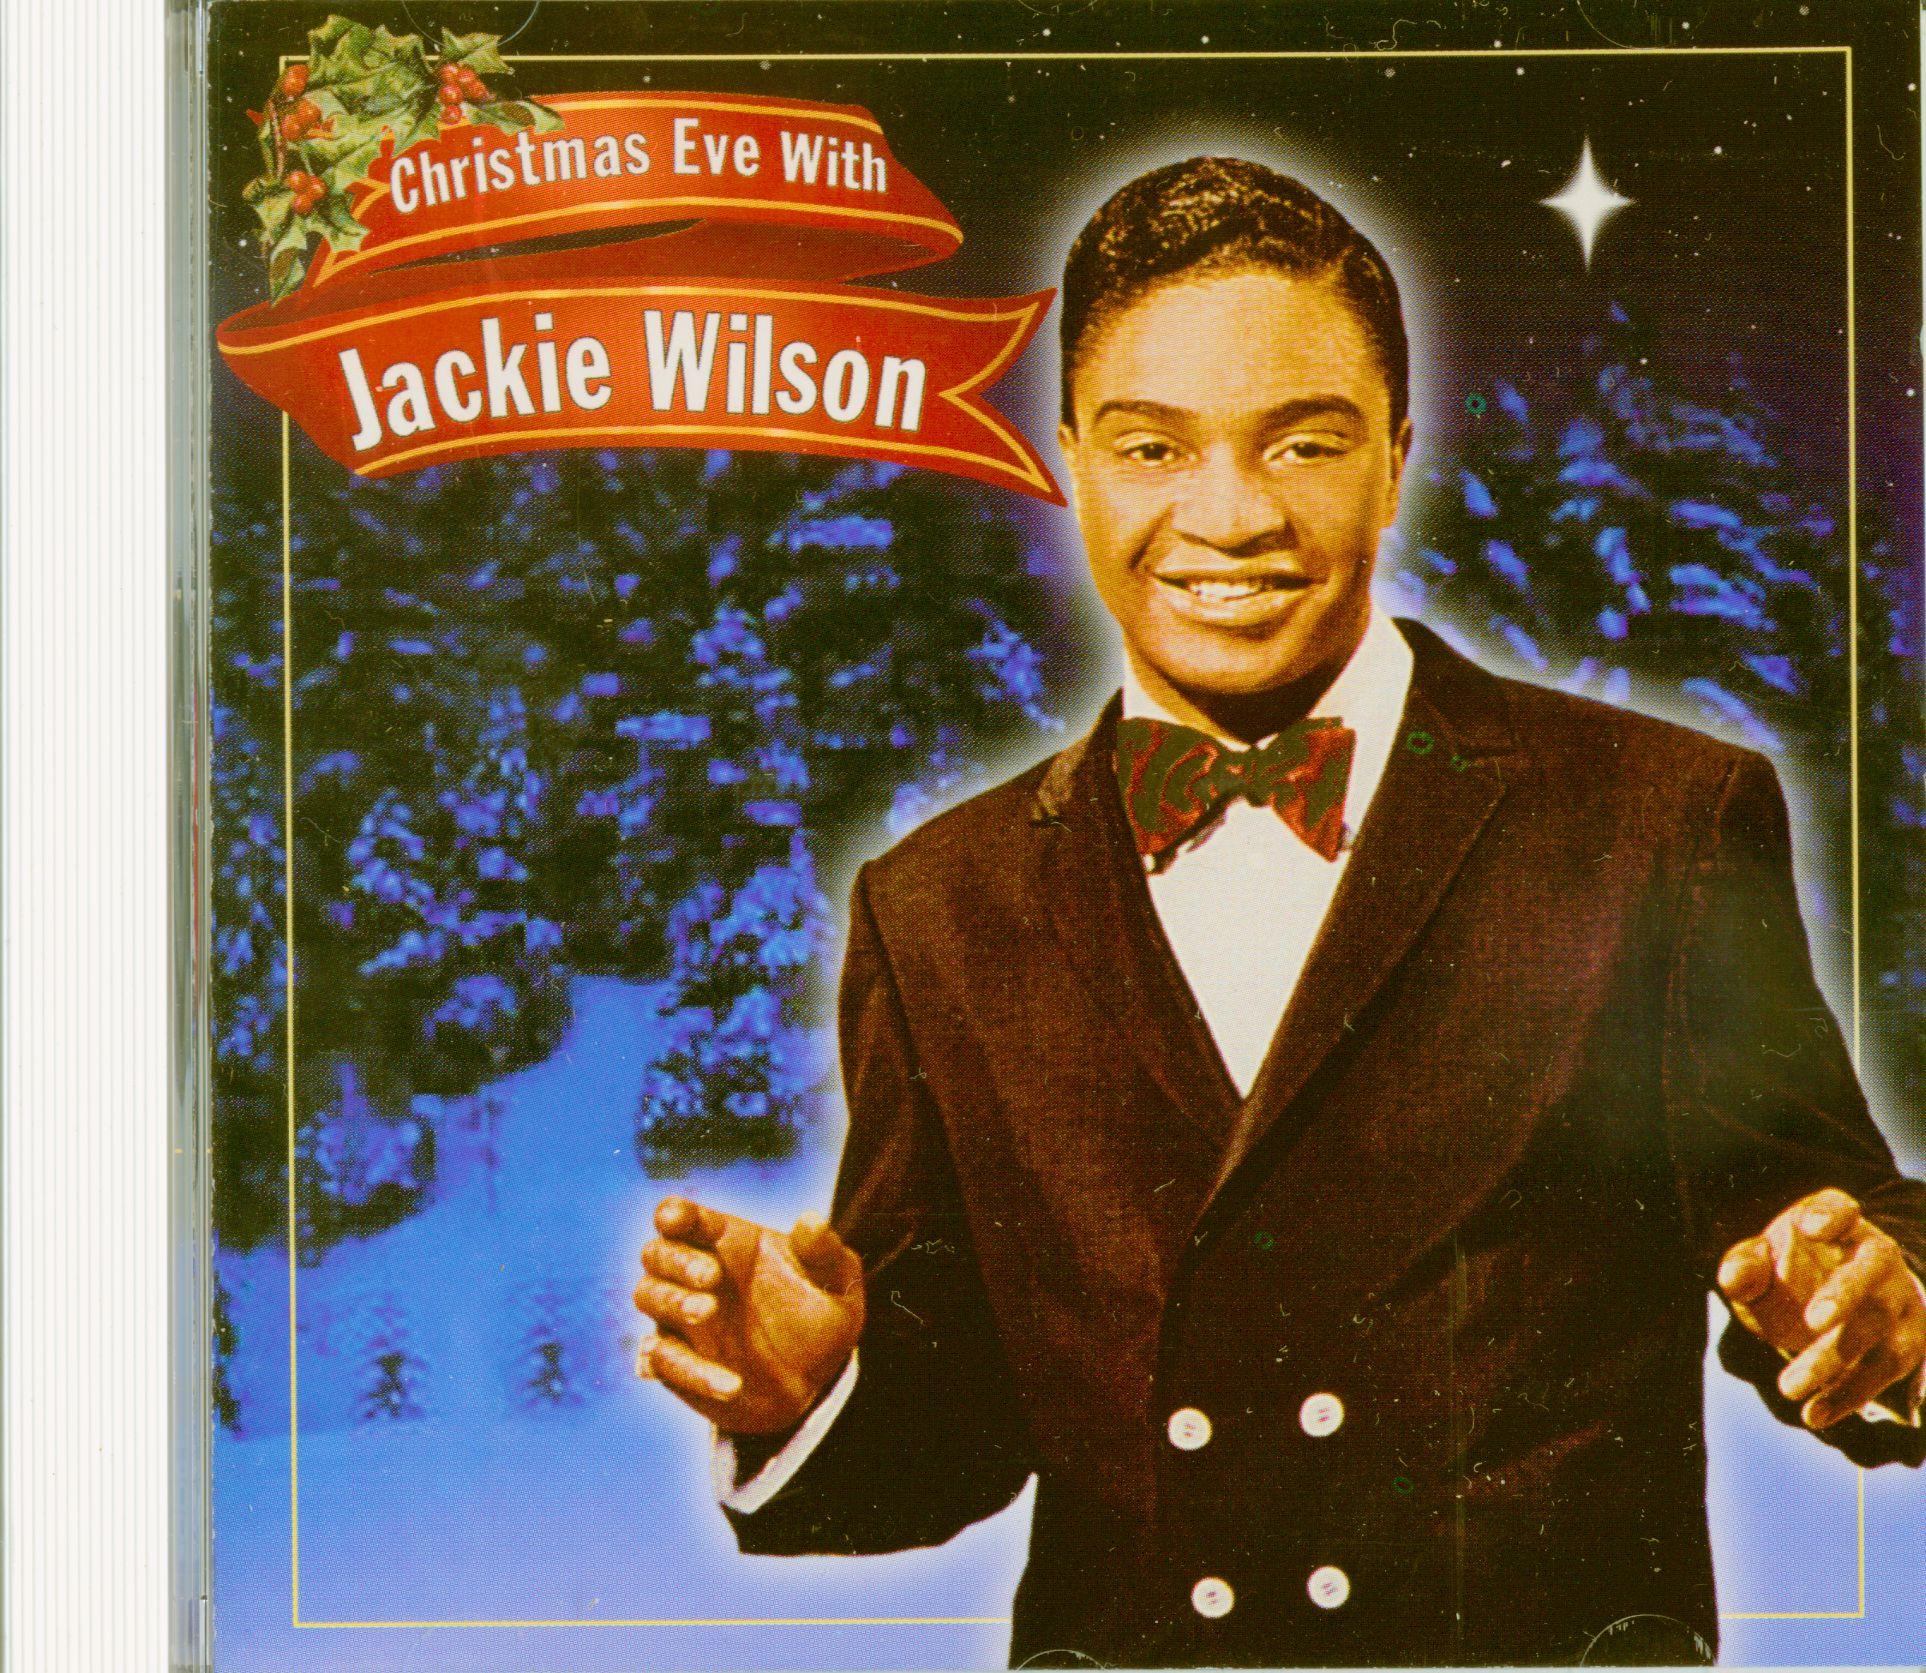 Jackie Wilson CD: Christmas Eve With Jackie Wilson - Bear Family Records